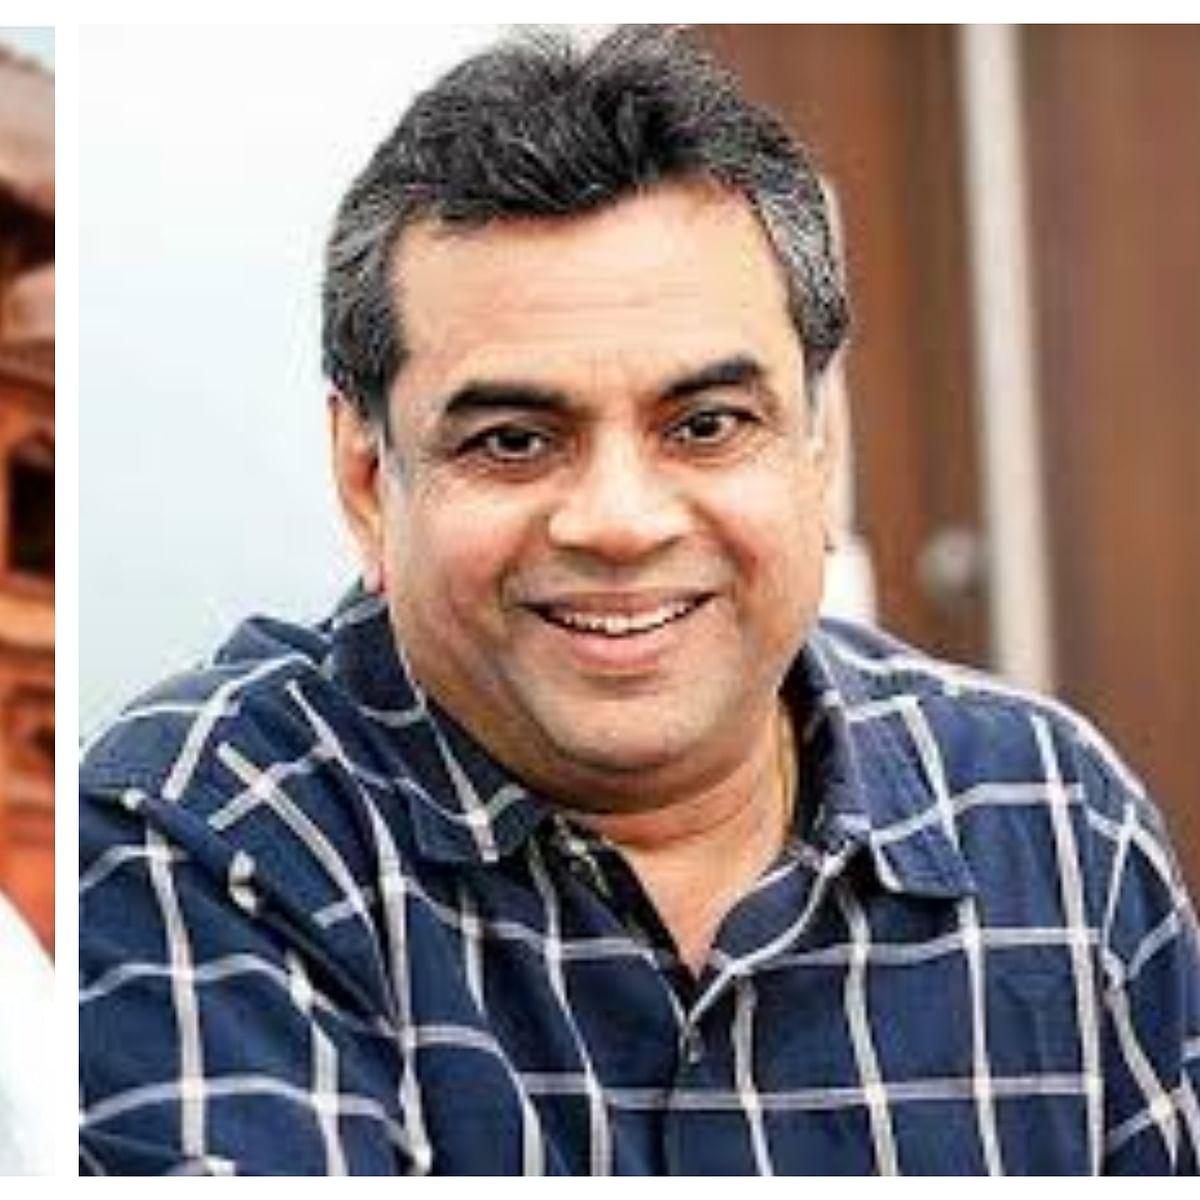 Paresh Rawal's son Aditya to debut as actor in OTT film 'Bamfaad'